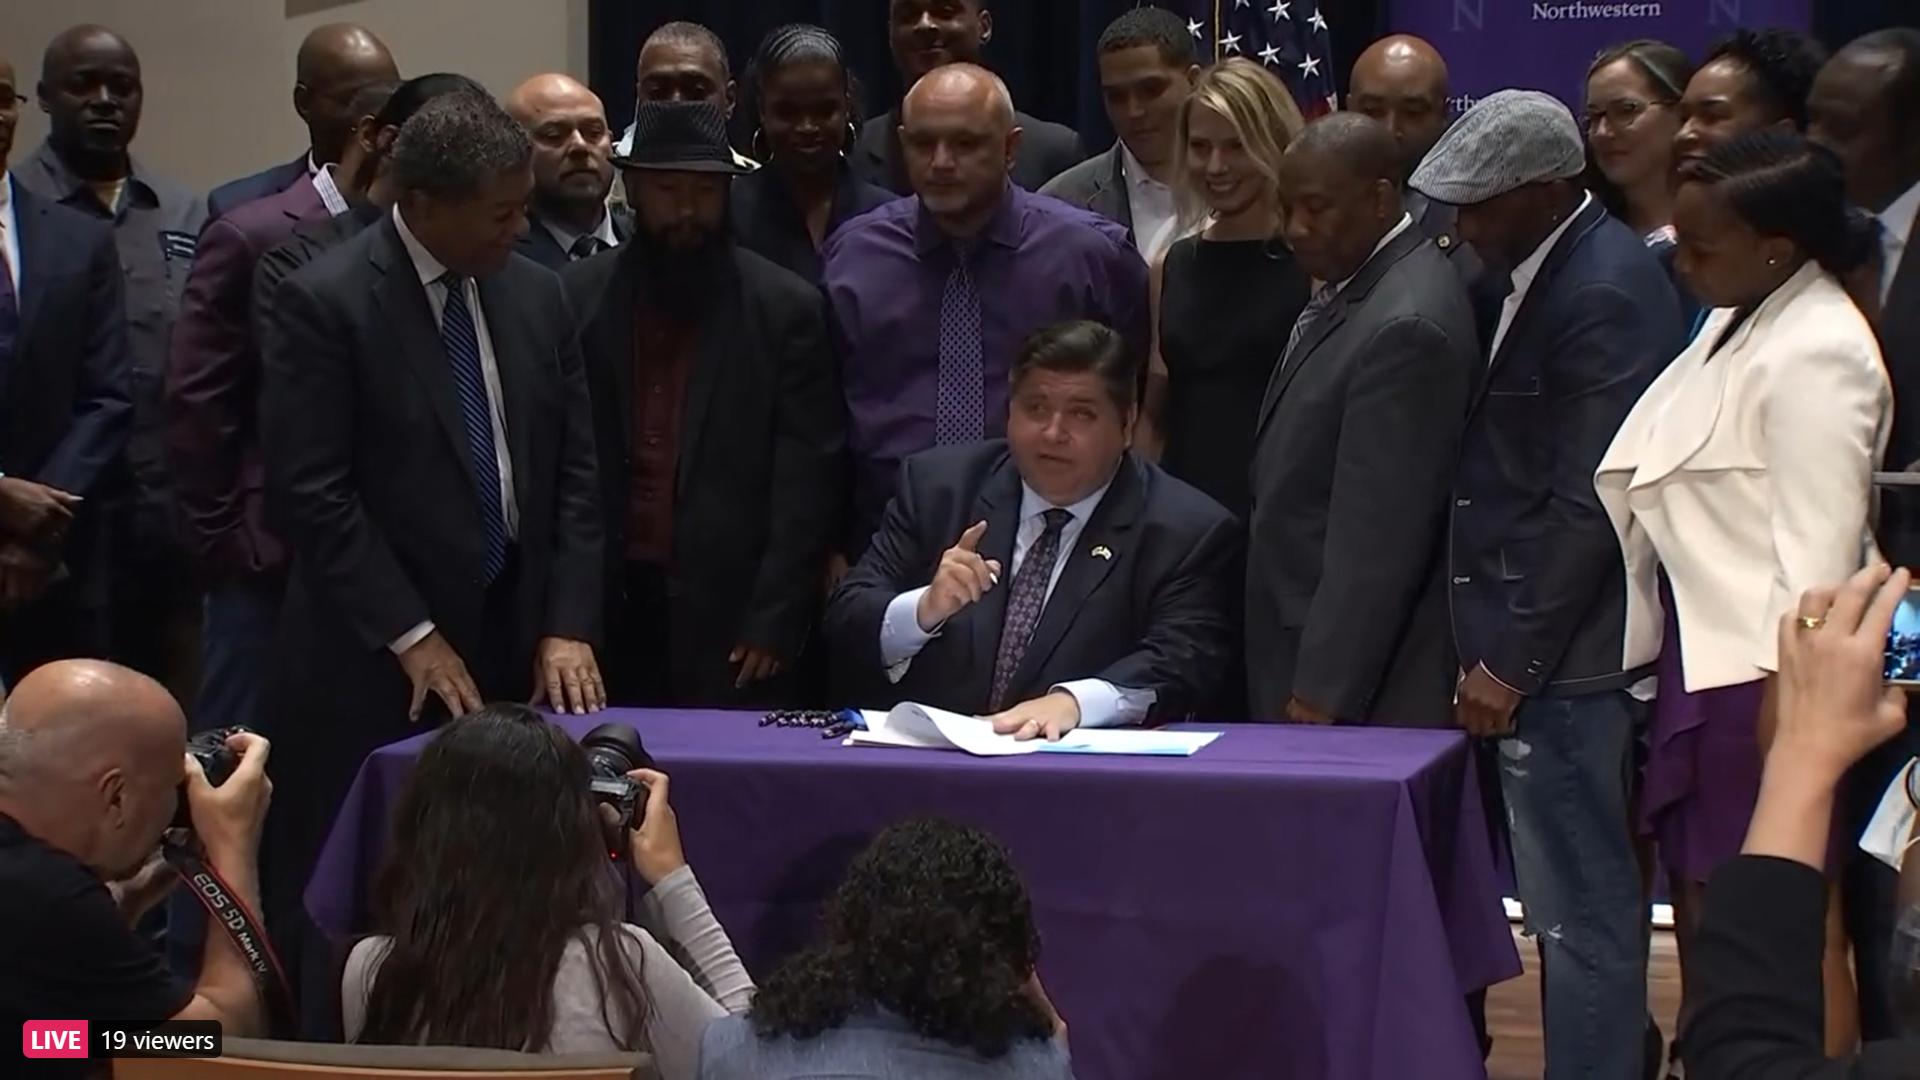 Pritzker signs more criminal justice bills into law